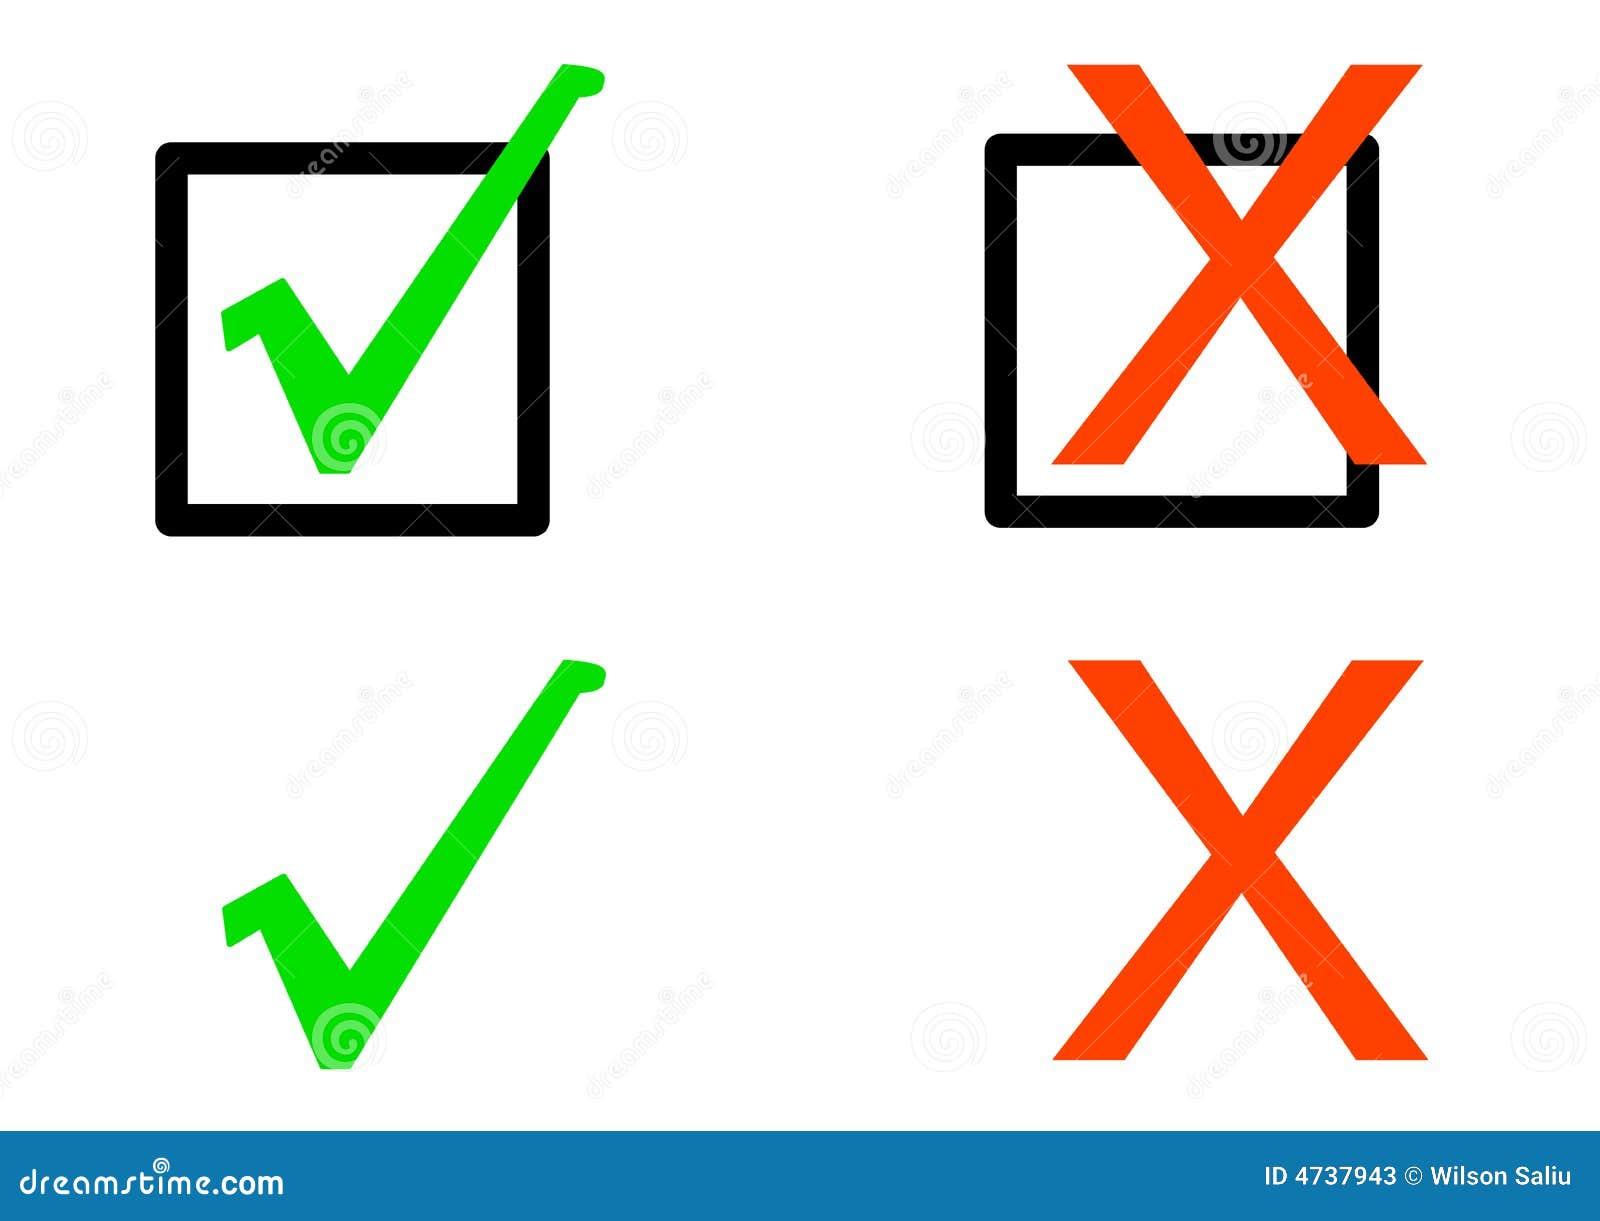 Simple Check Symbols Stock Photos Image 4737943